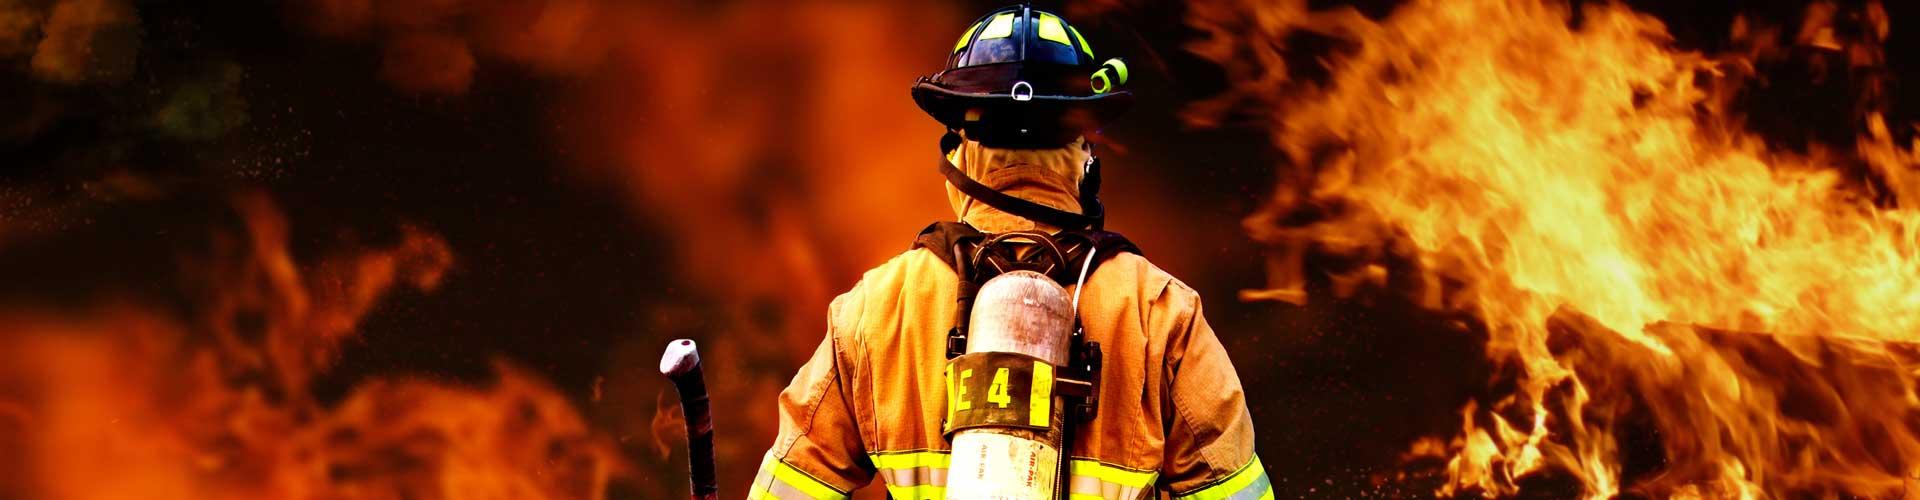 Fireman-Walking